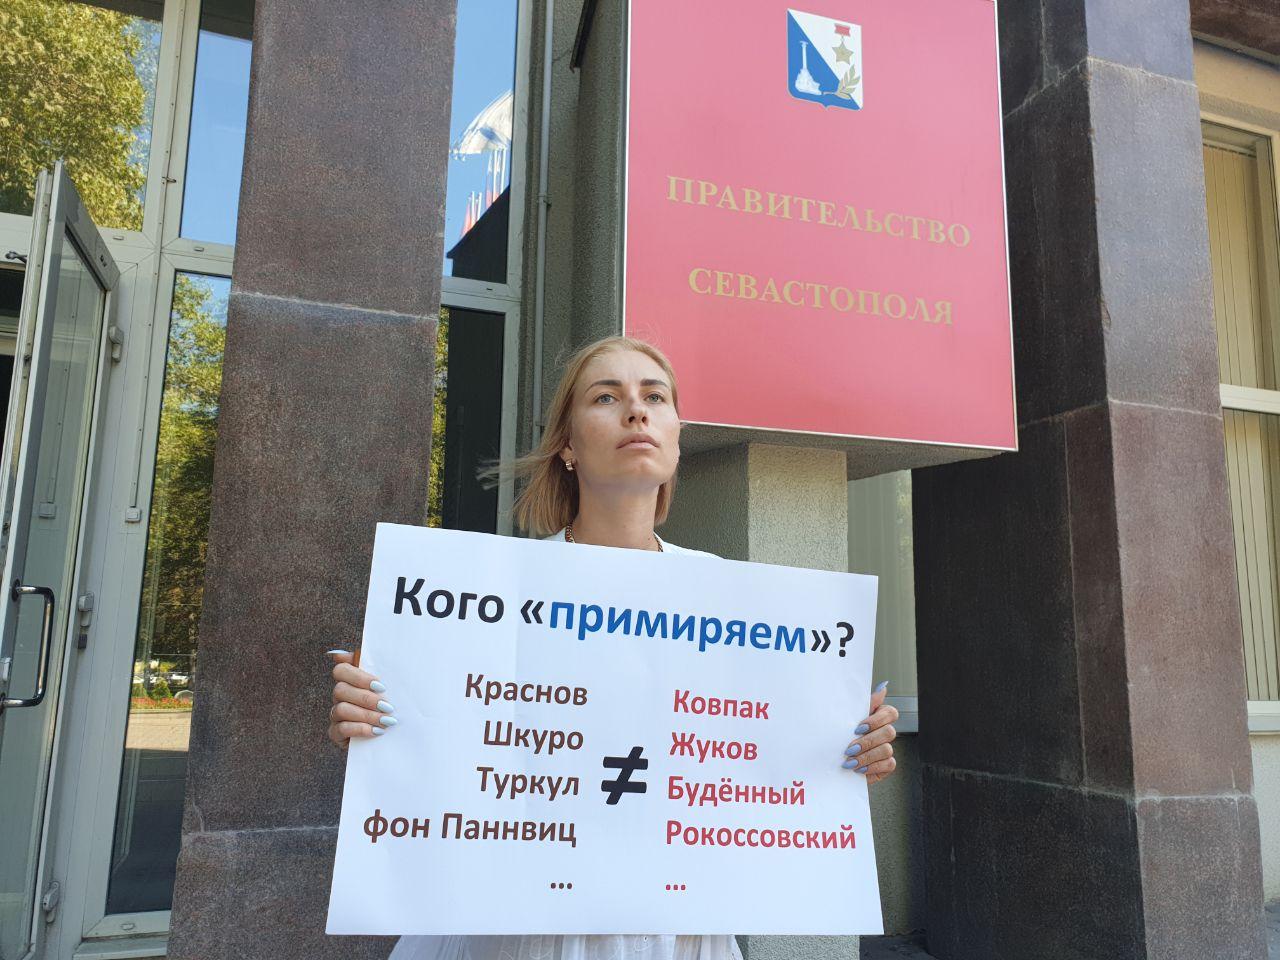 Екатерина Чепурная.jpg